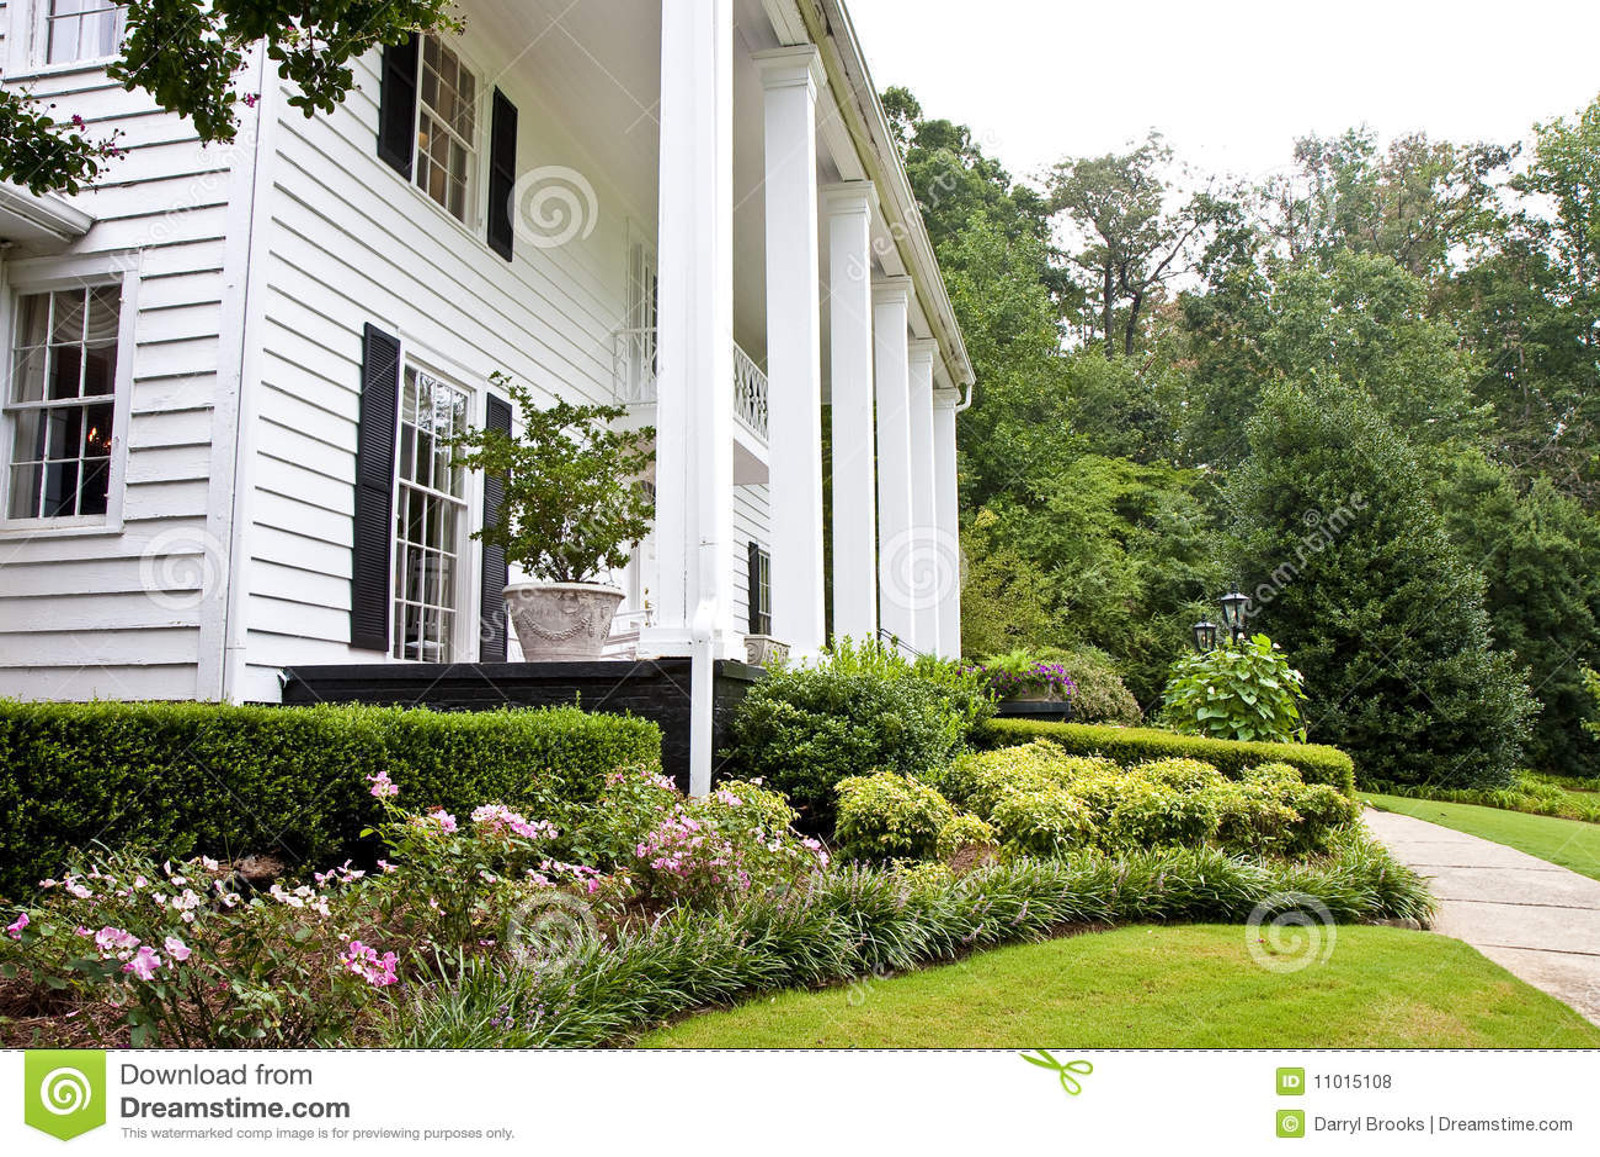 imagens jardins pequenos : imagens jardins pequenos:Fotos de Stock Royalty Free: Jardins pequenos